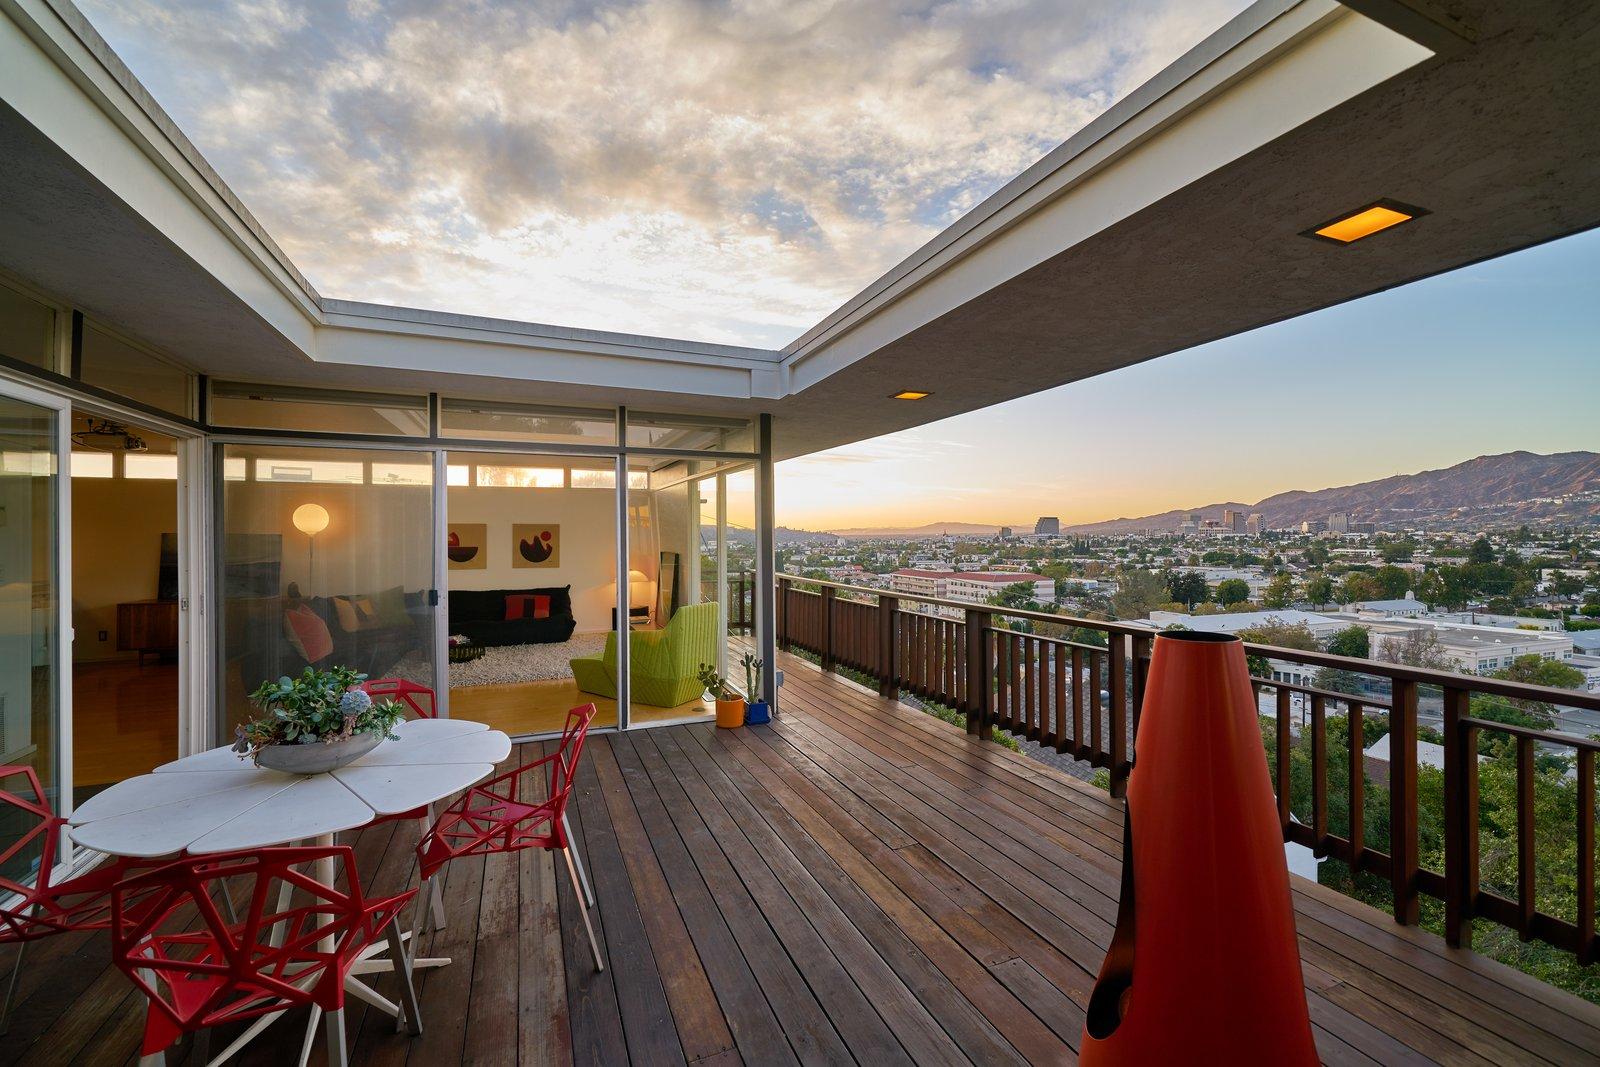 A MidcenturyModern Home in LA Designed by Richard Banta